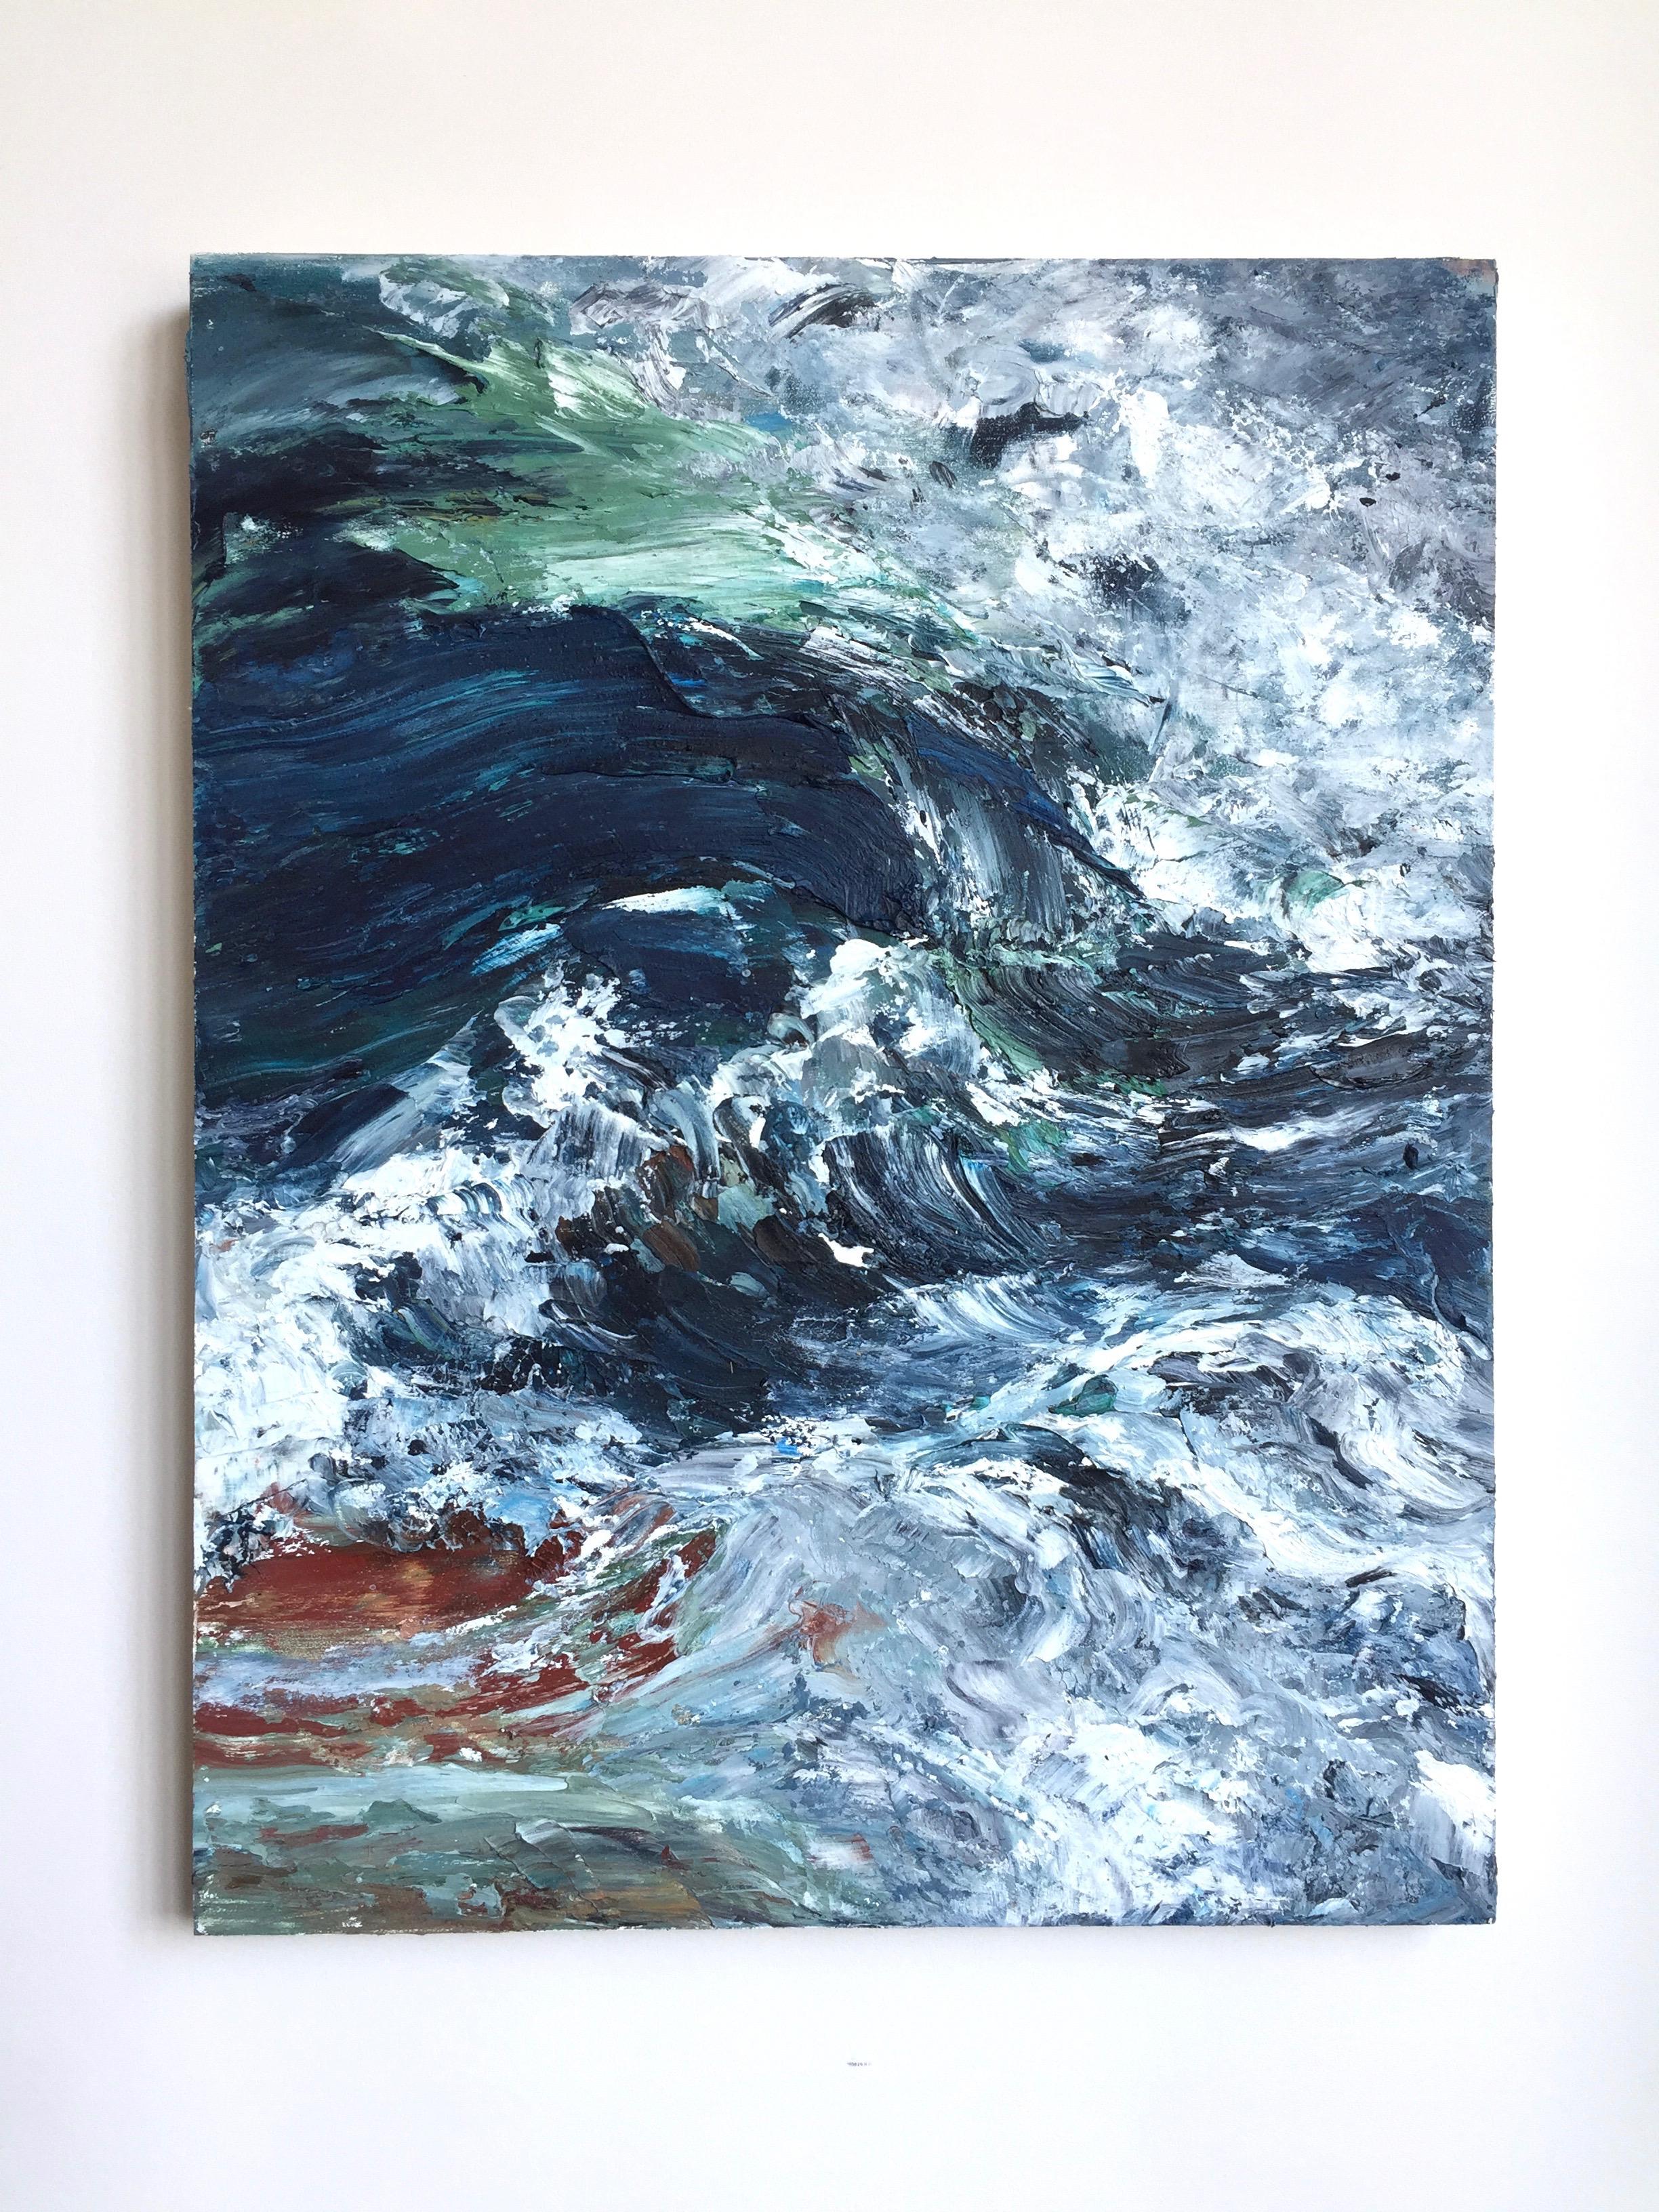 Rapture-SeaPower-16x20-TiffanyBlaise-install.jpg